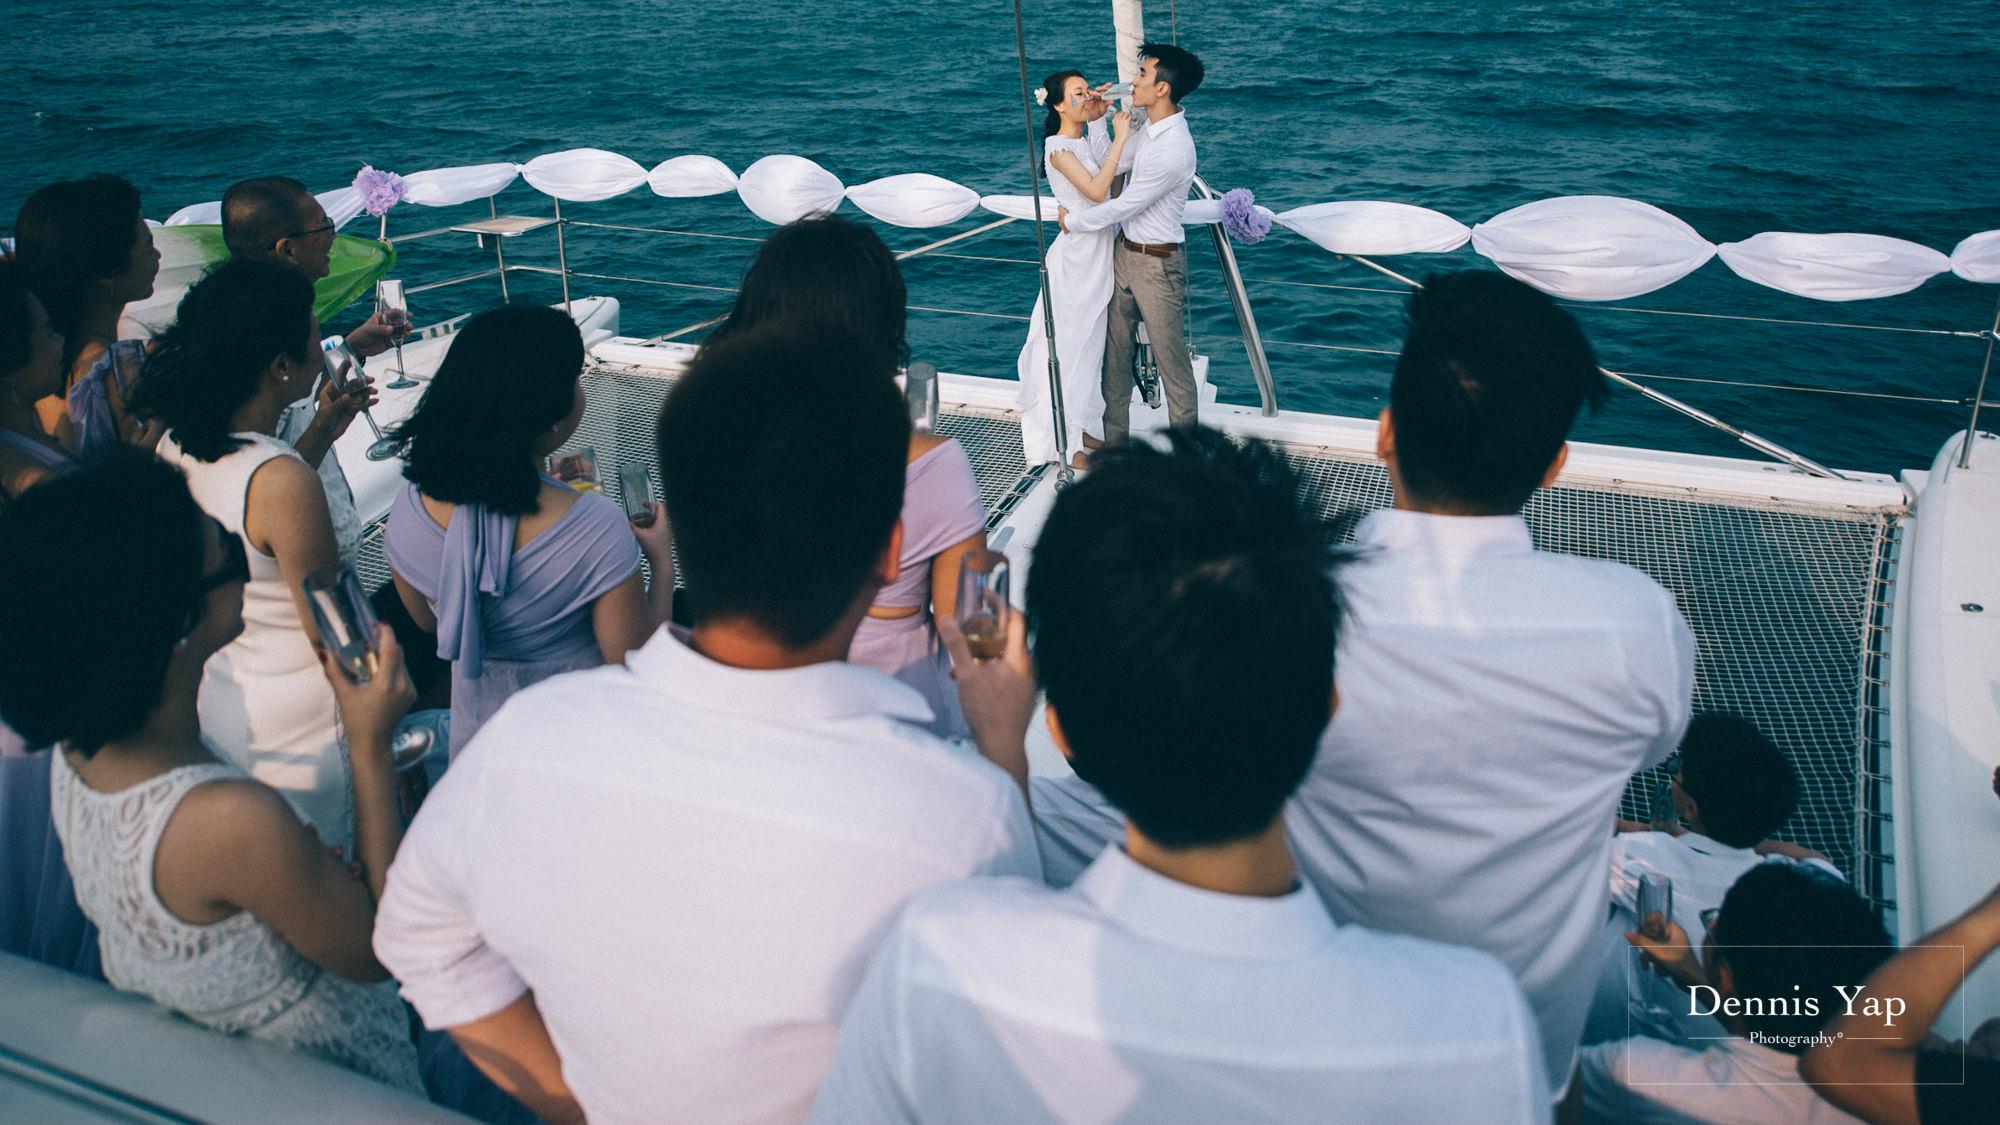 danny sherine wedding reception registration of marriage yacht fun beloved sea dennis yap photography malaysia top wedding photographer-36.jpg